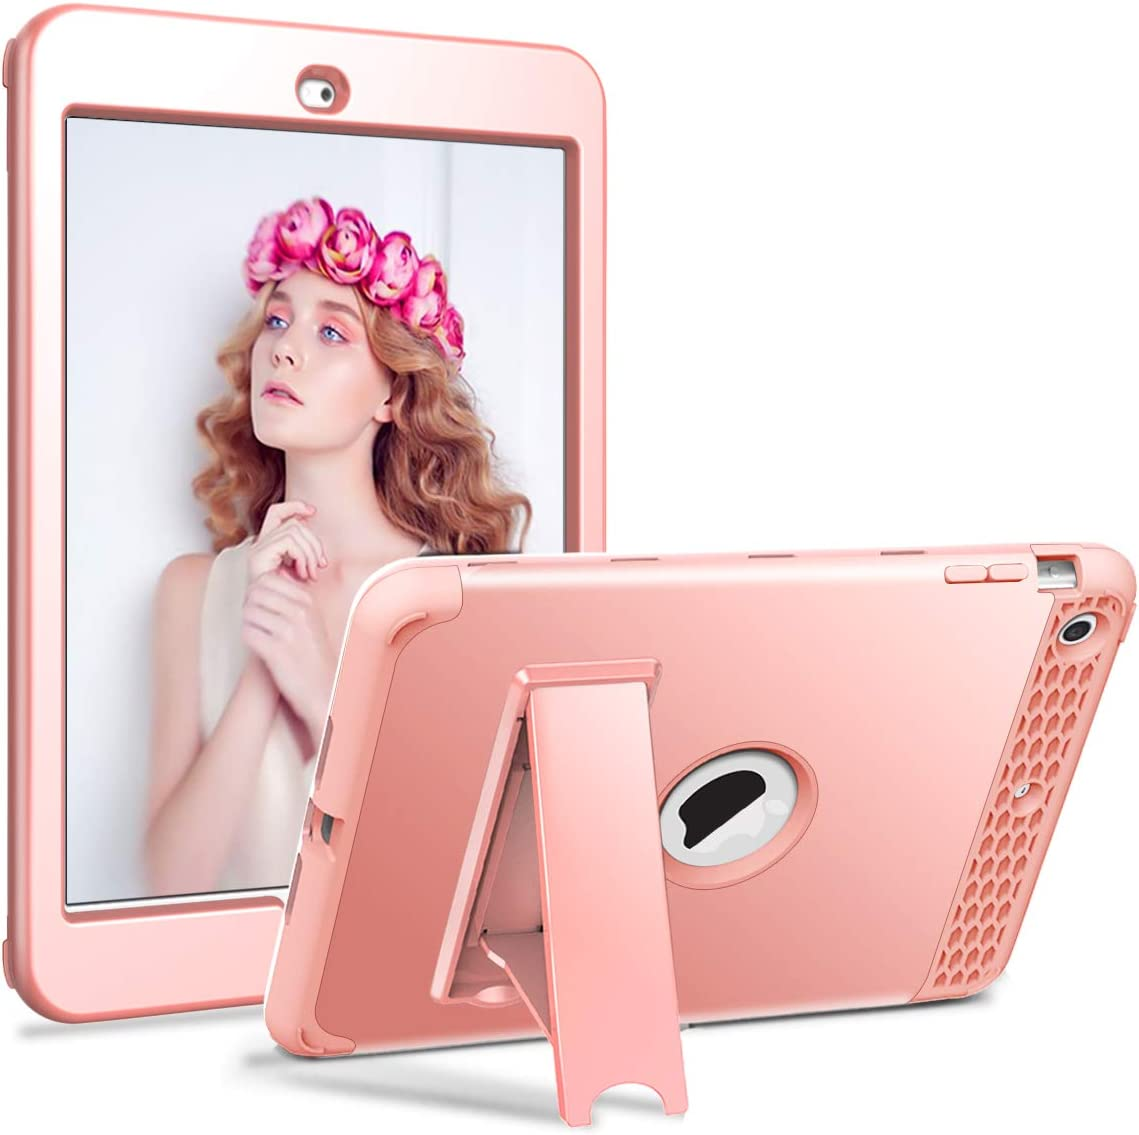 iPad Mini Case, Mini 2 Case, Mini 3 Case, Elepower Three Layer Hybrid Durable Sturdy Kickstand Full-Body Shockproof Protective Case Cover for Apple iPad Mini 1/2/3, Rose Gold